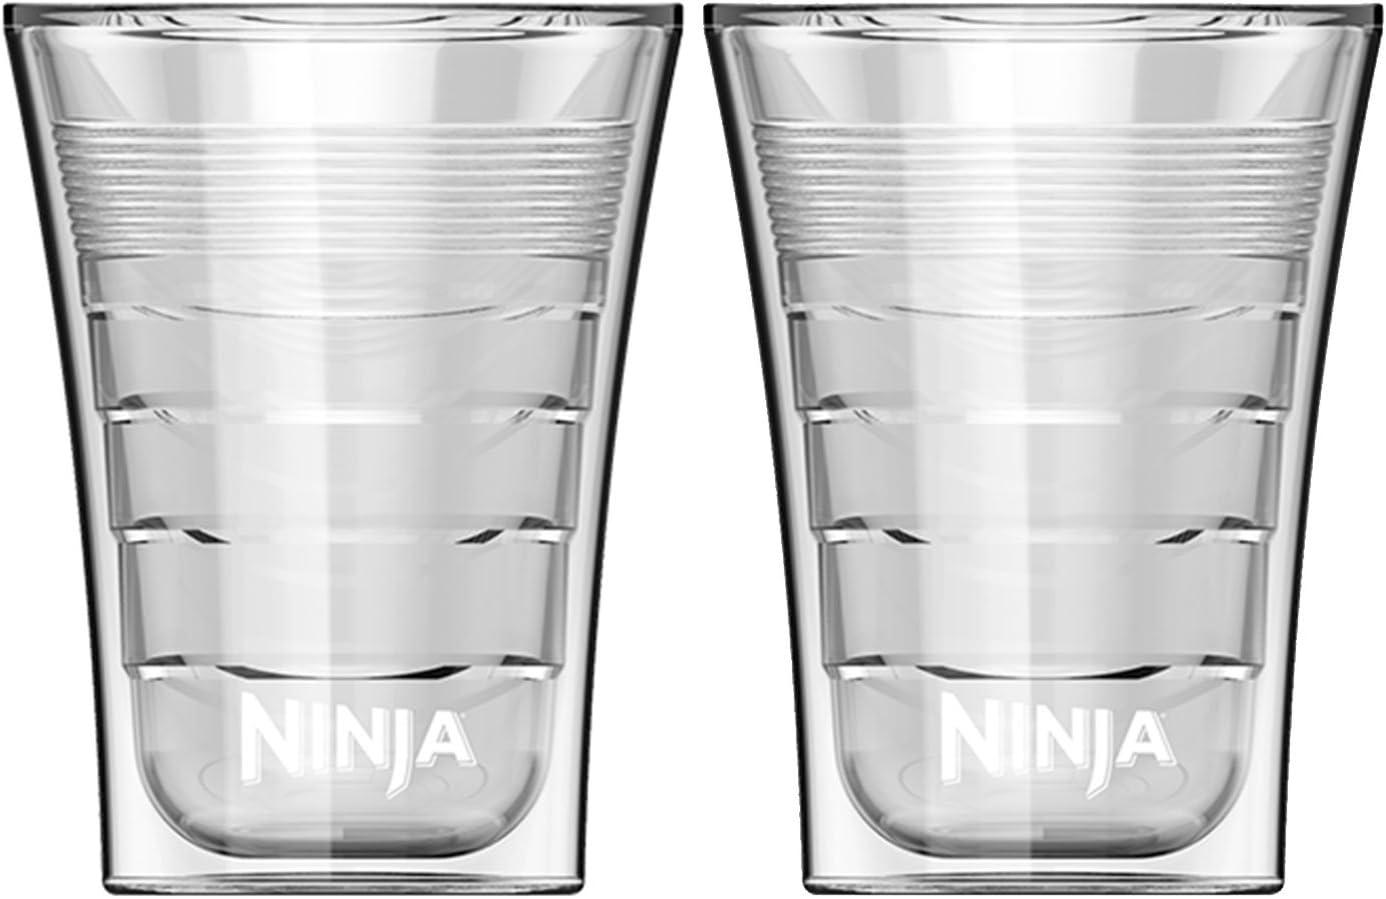 Ninja 14 Ounce Microwave Safe Plastic Double Insulated Cup for Ninja Coffee Bar (2)